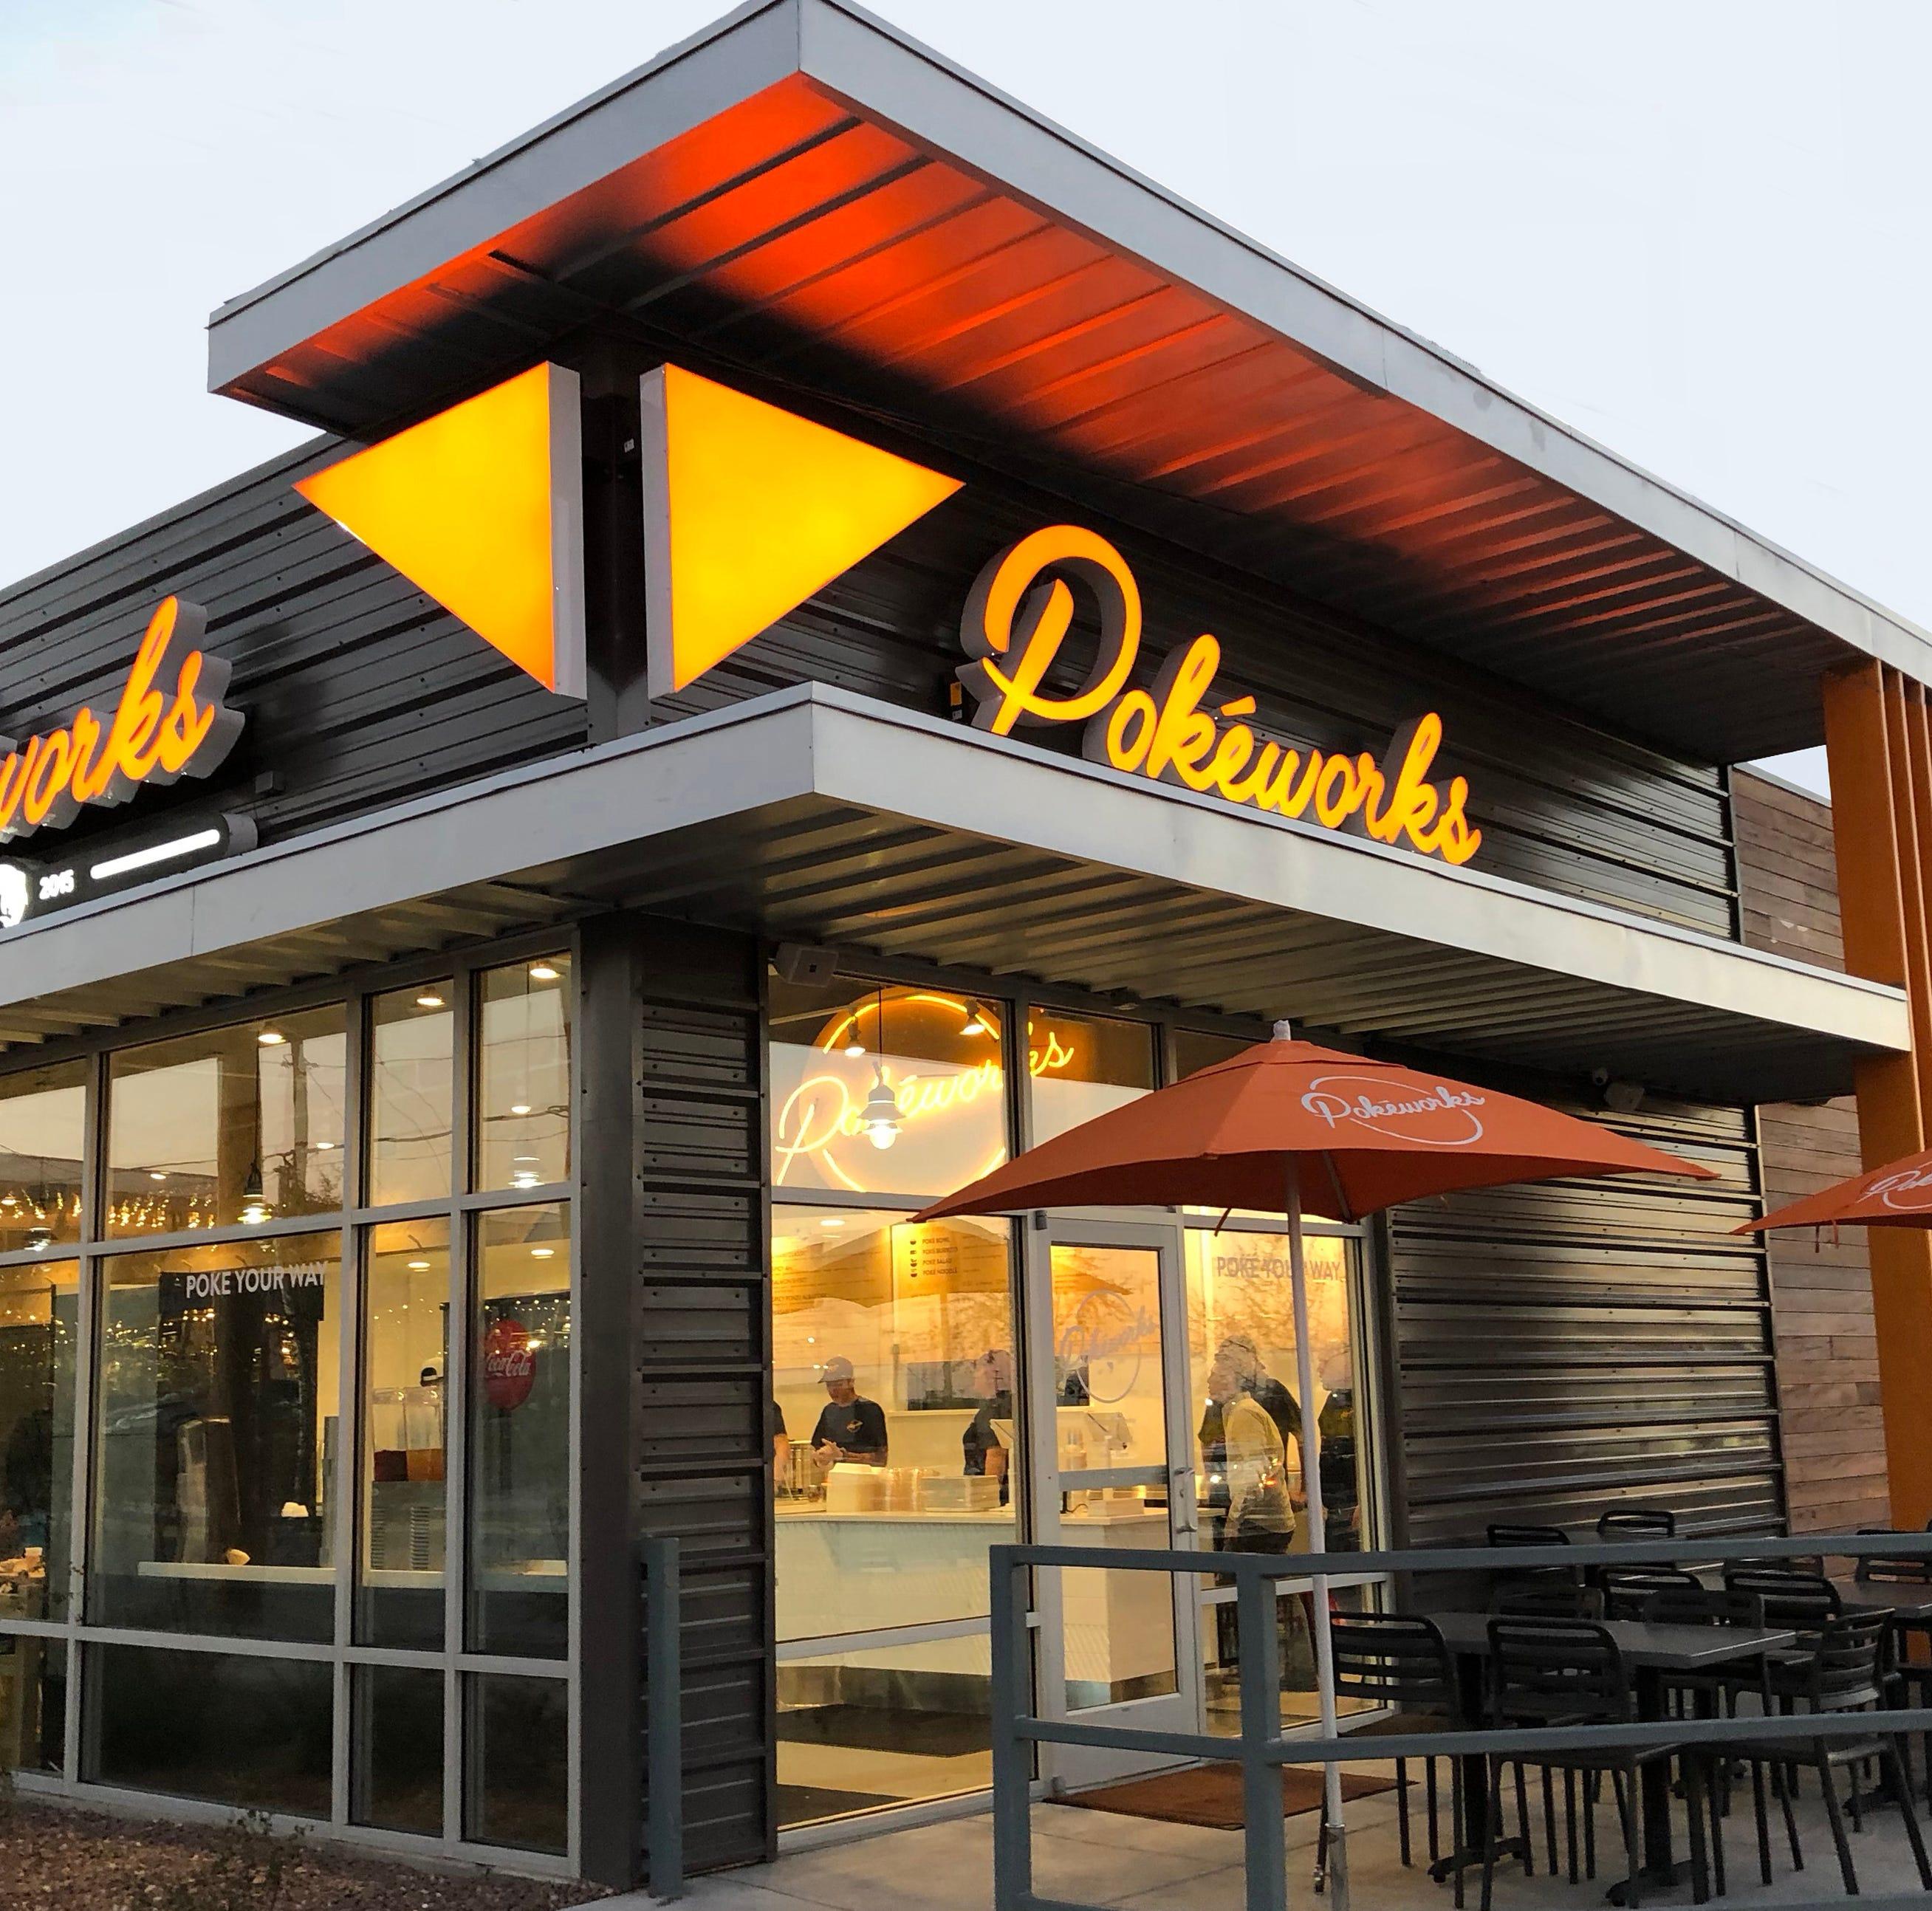 Pokéworks restaurant coming to Knoxville in November